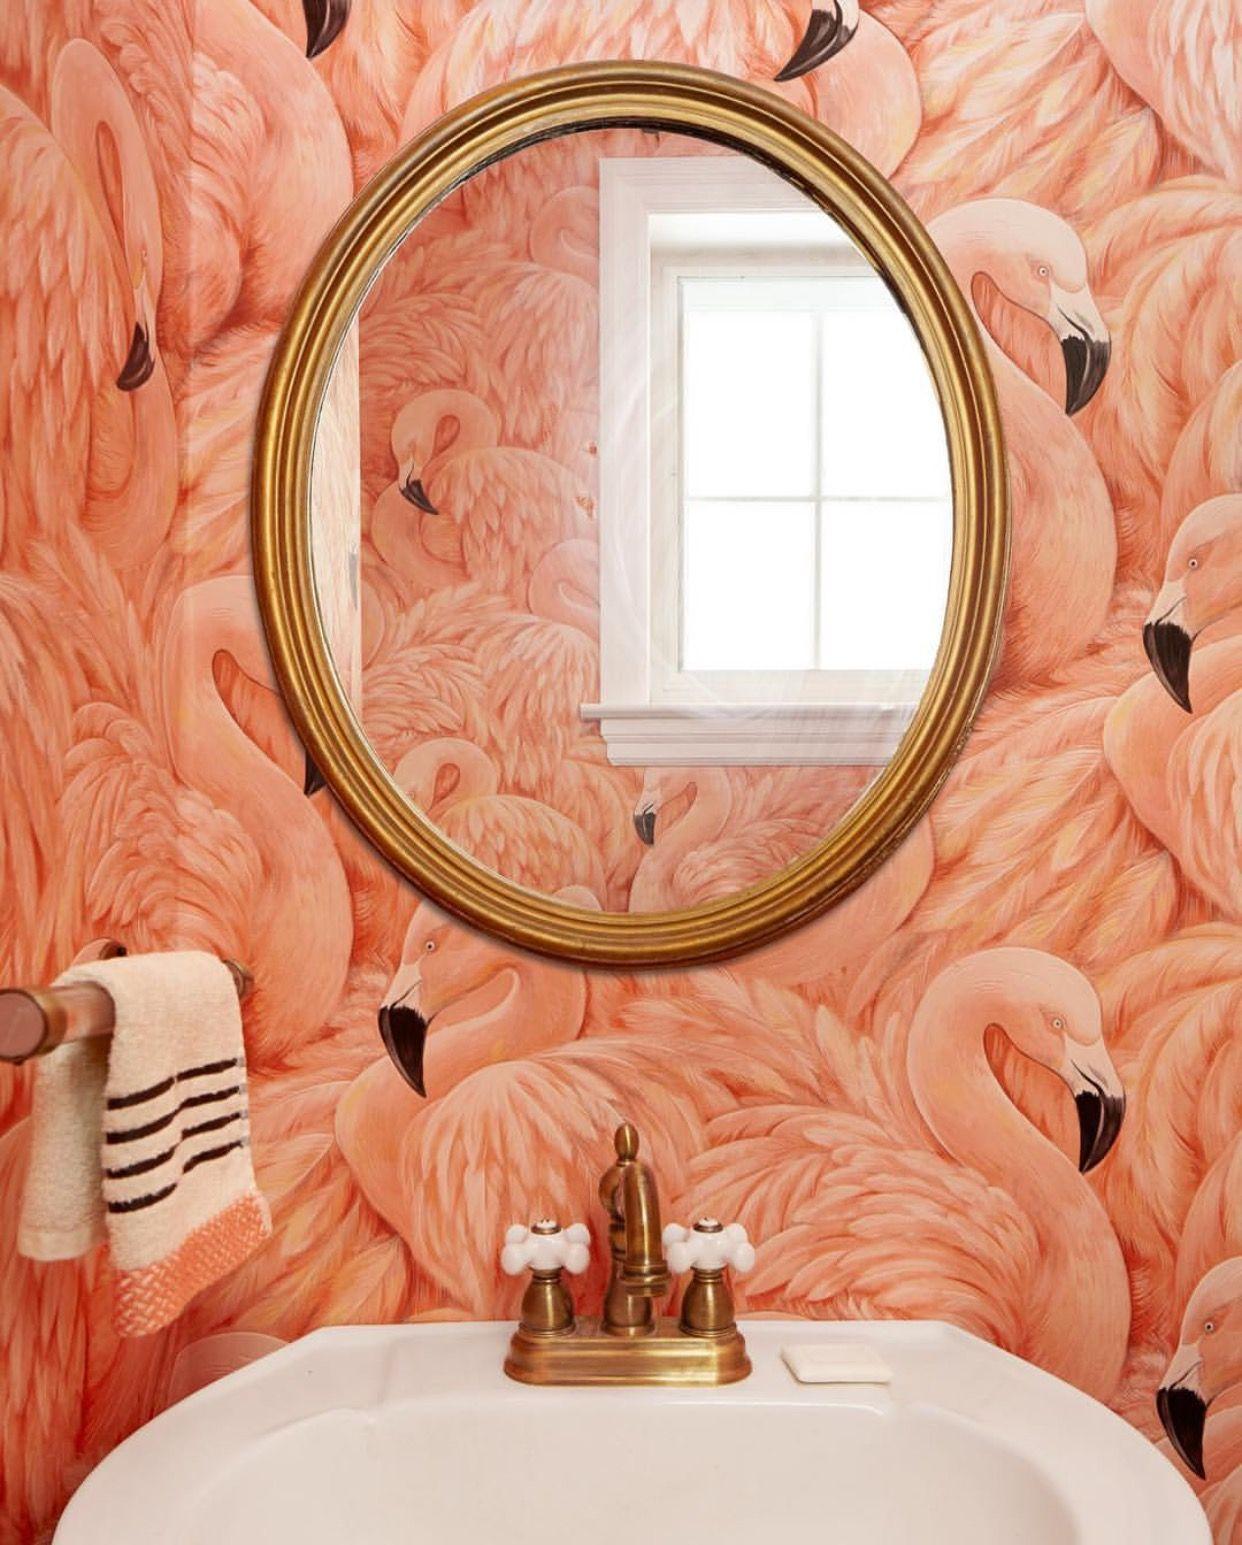 Deco Salle De Bain Flamant Rose ~ flamingo wallpaper bathrooms pinterest salle de bains salle